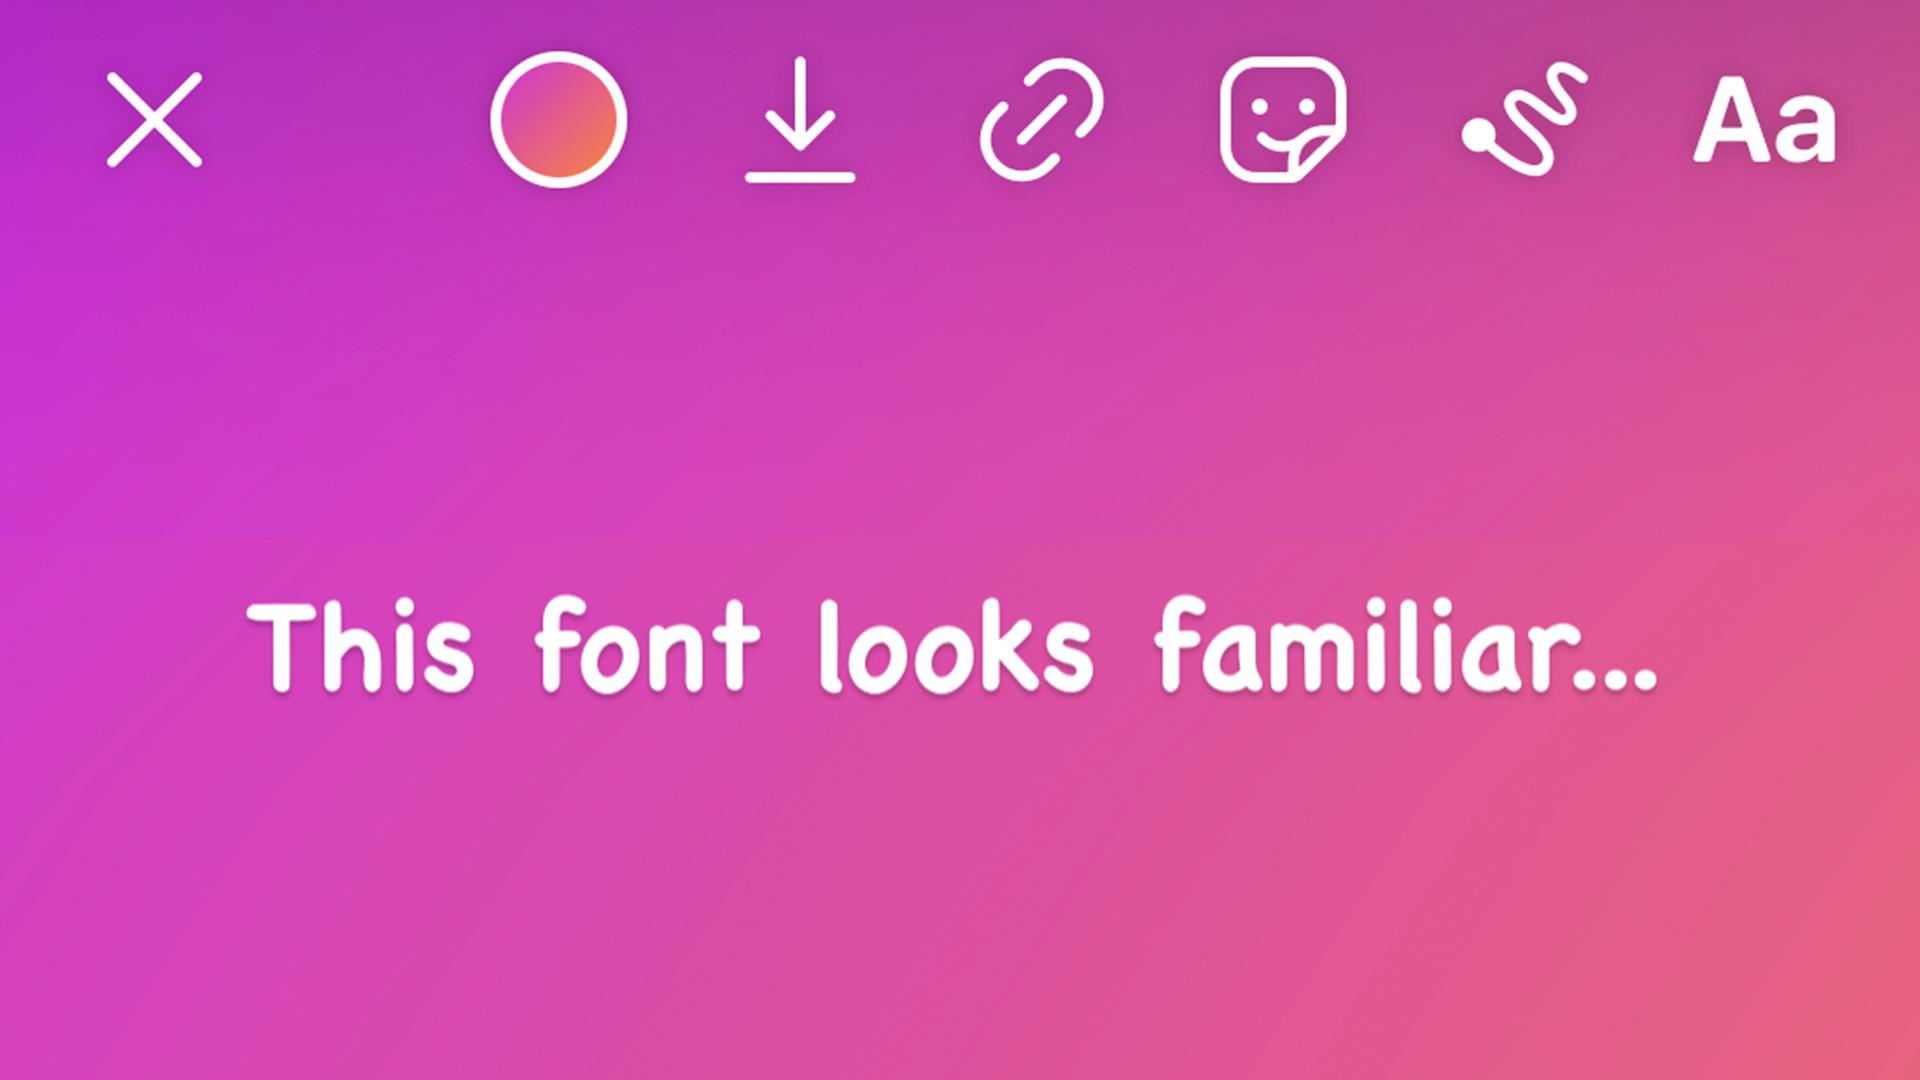 Instagram aggiunge nuovi font alle Storie, c'è pure il Comic Sans